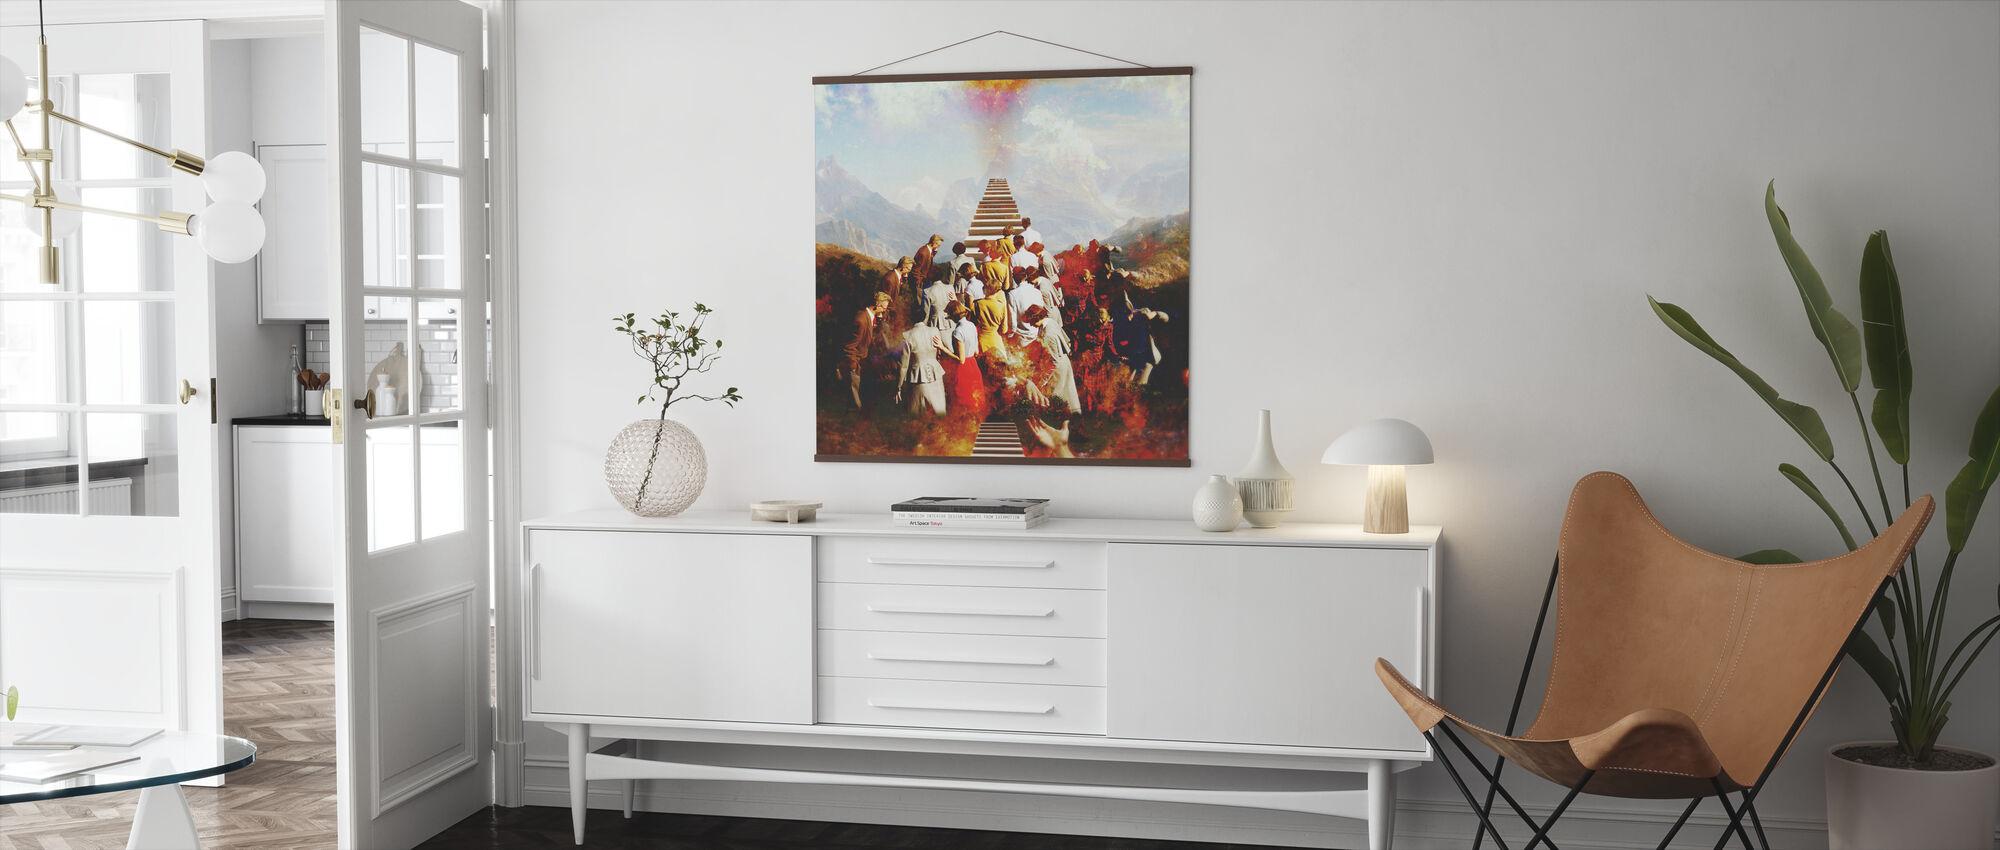 Ascension - Poster - Living Room